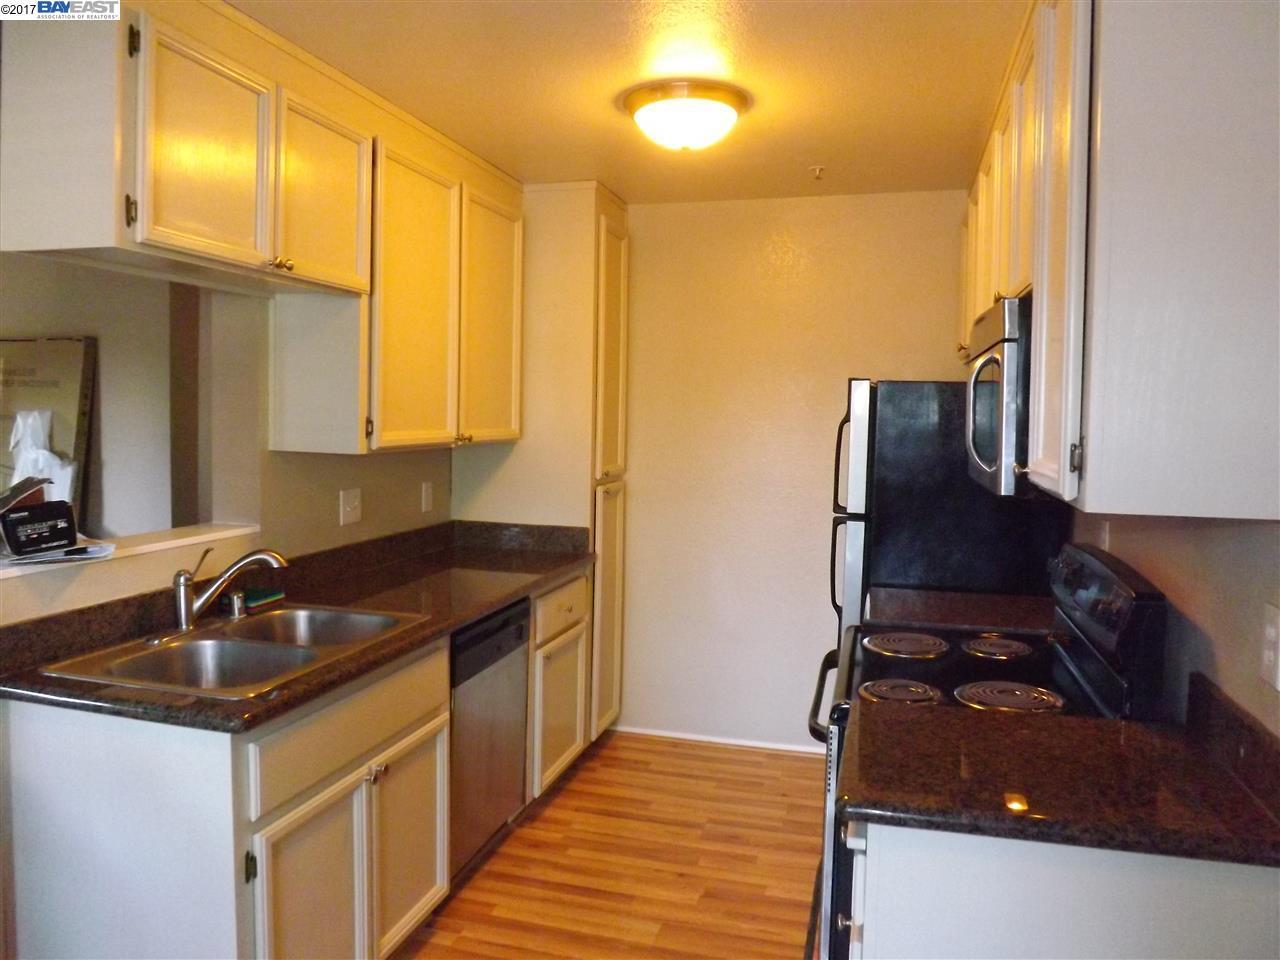 Additional photo for property listing at 37490 Parish Circle  Fremont, Калифорния 94536 Соединенные Штаты